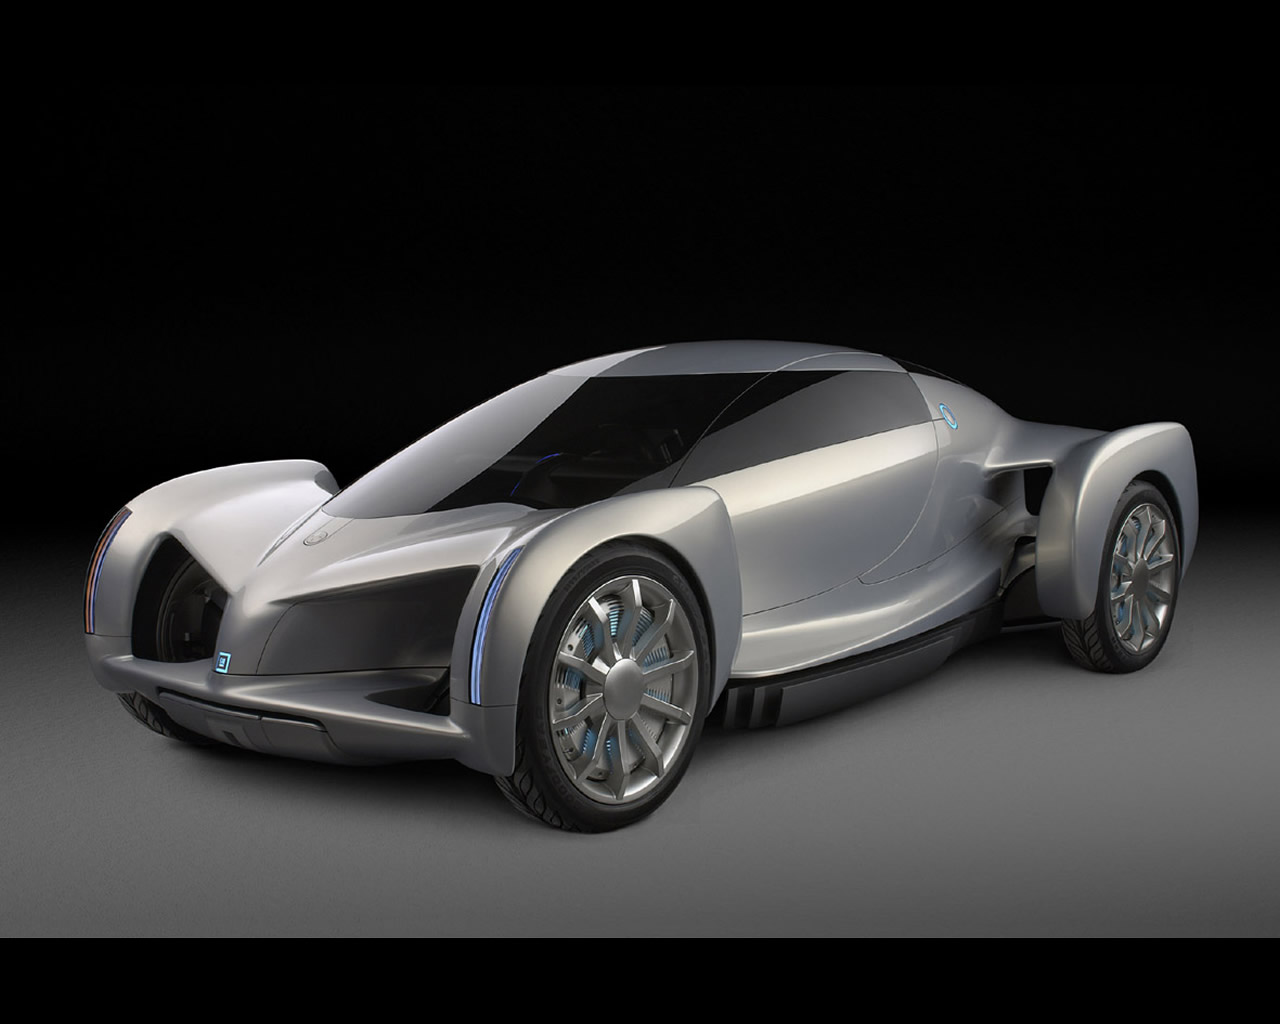 General motors autonomy concept 2002 for General motors vehicle purchase program